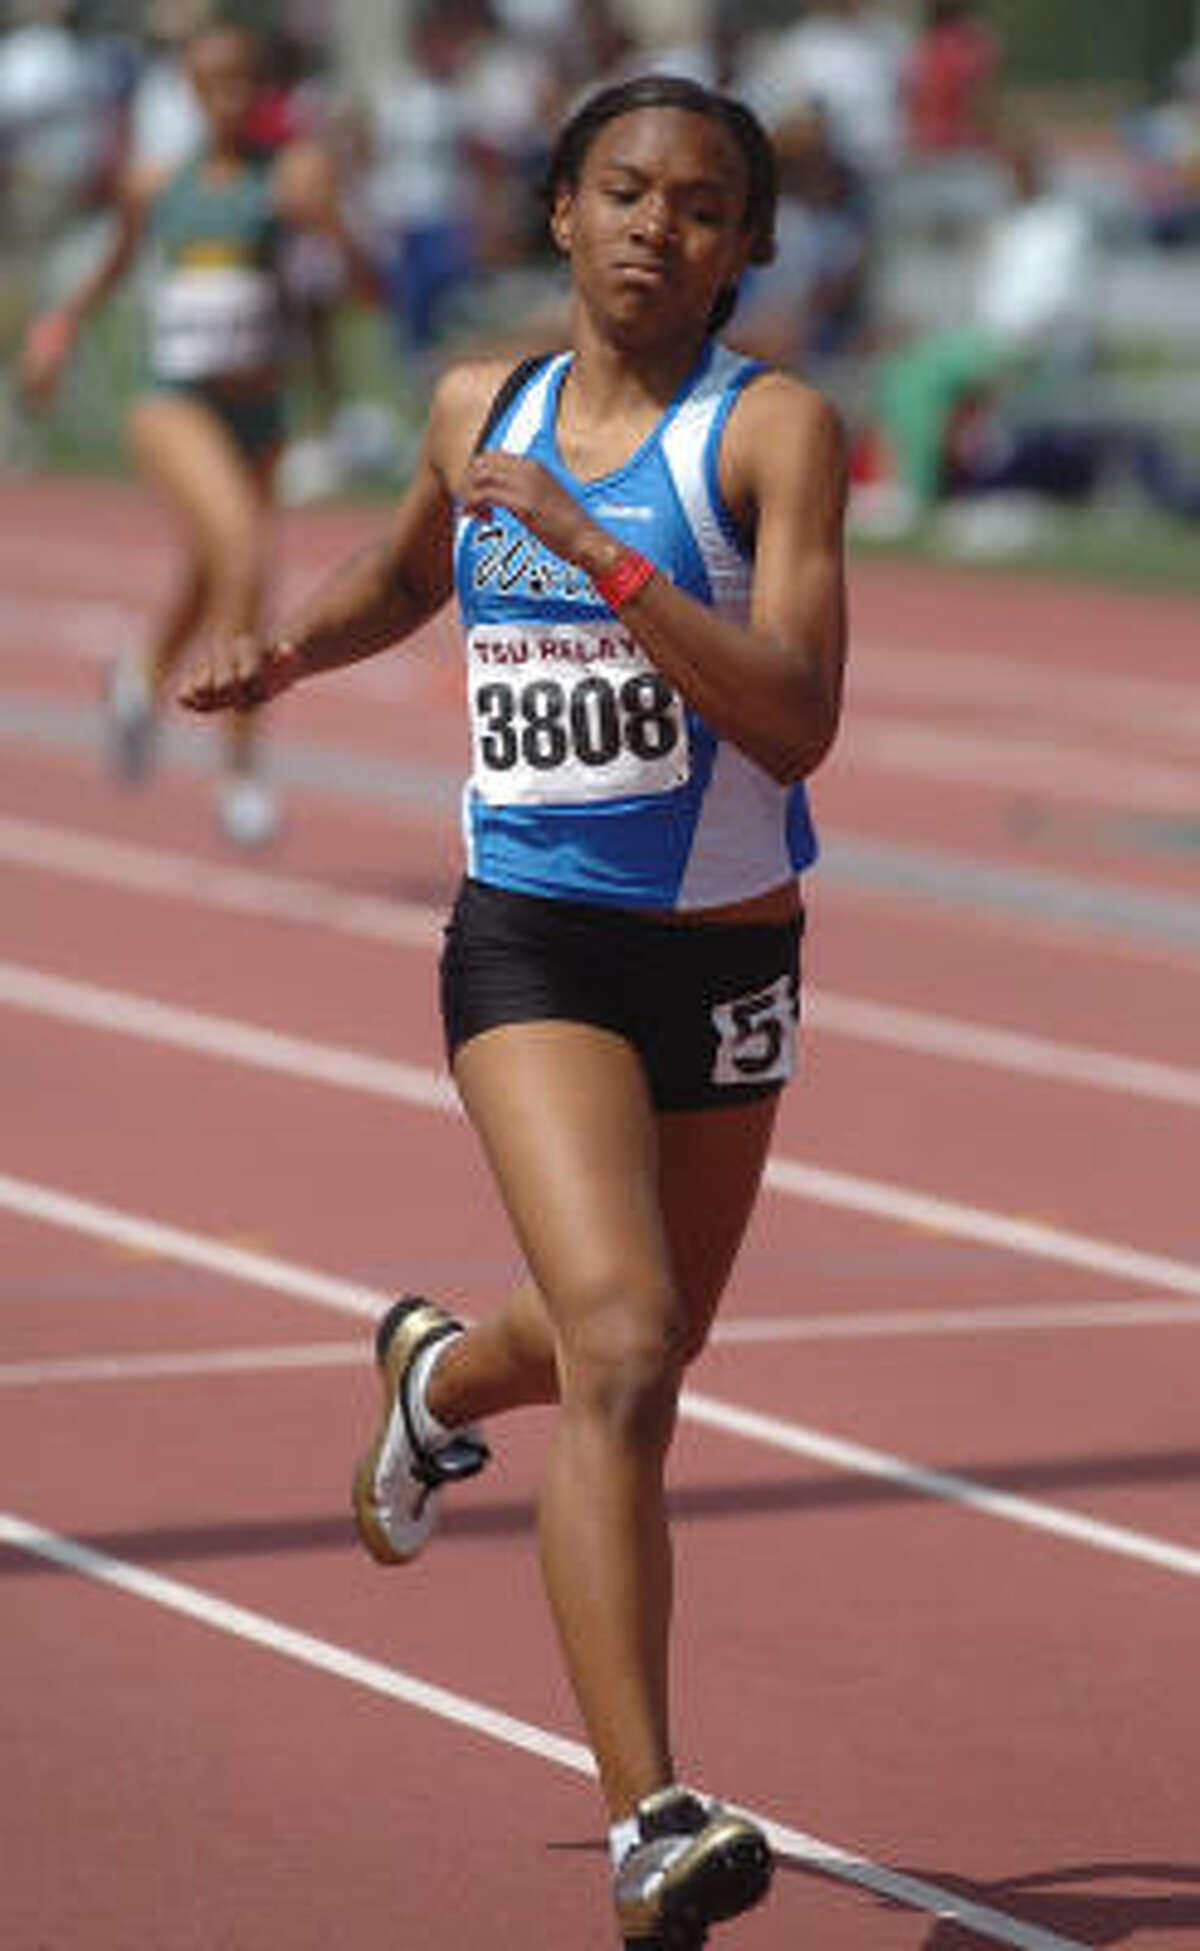 Lauren Reese of Westside competes in the 400-meter dash.